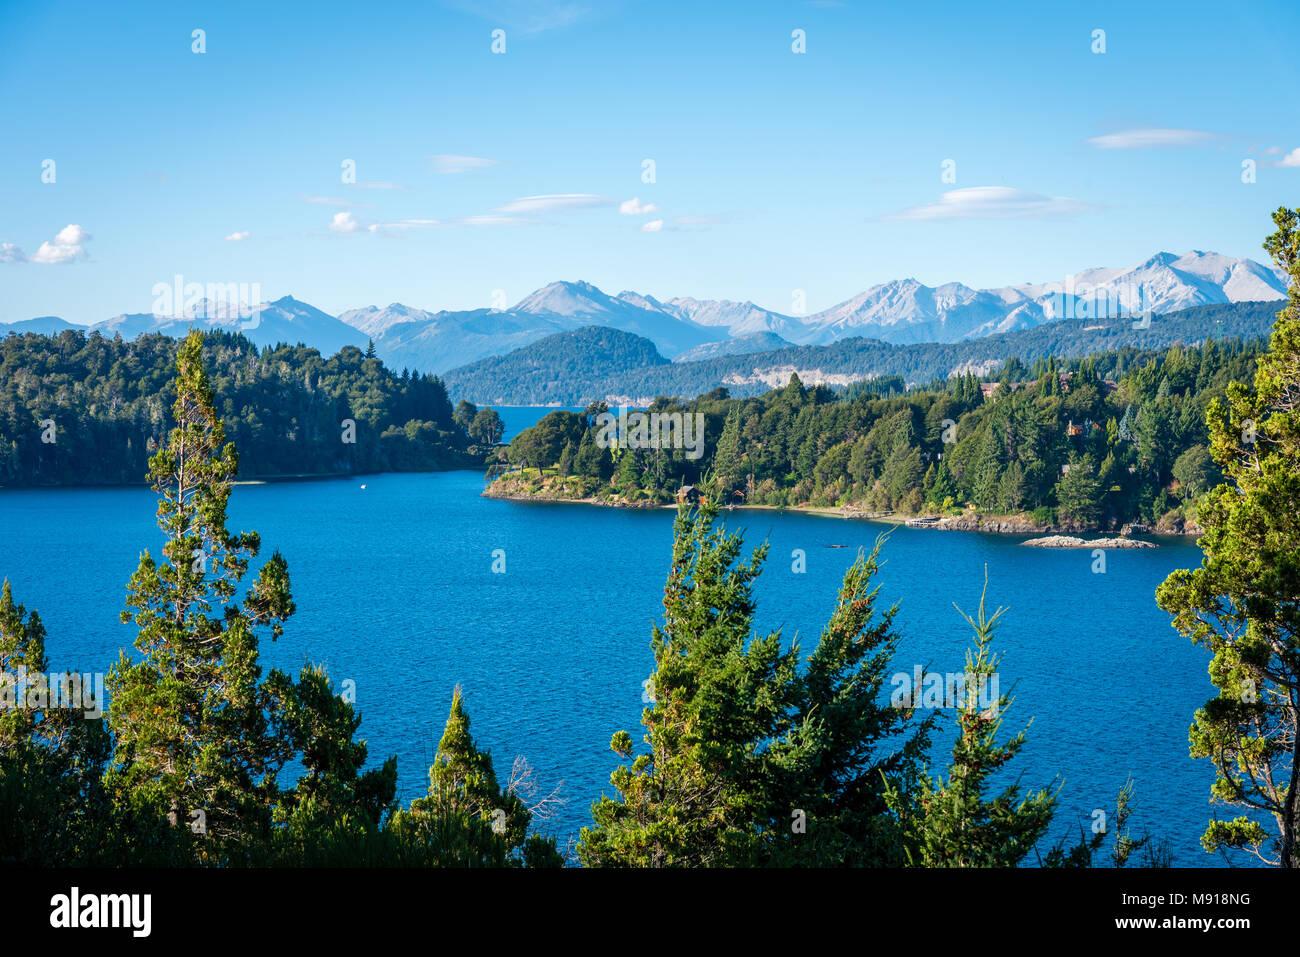 Lakes of Bariloche, Patagonia, Argentina - Stock Image